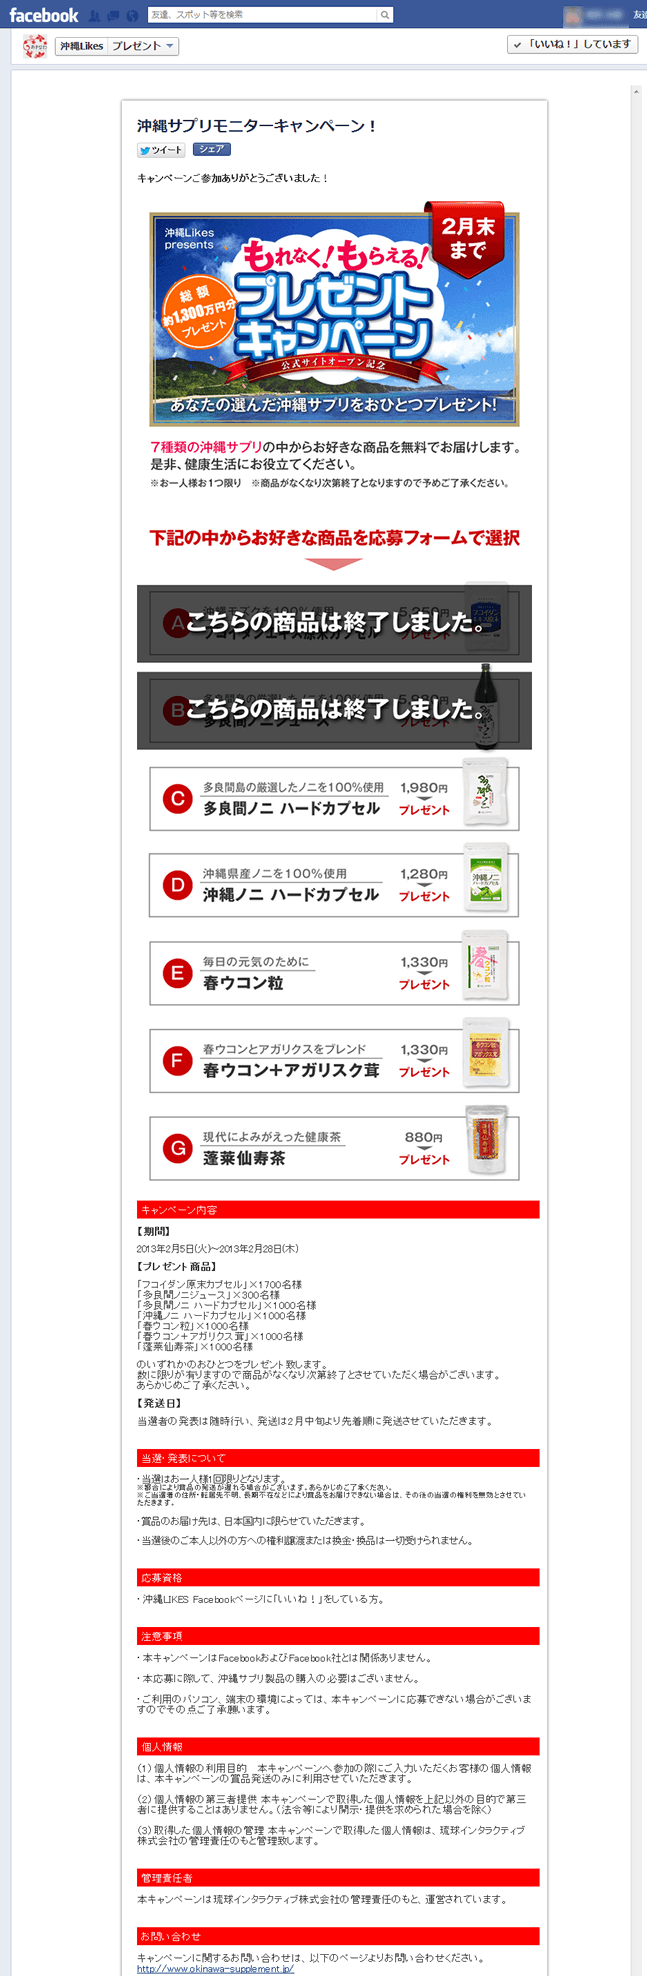 Fantastics 「サンプリング型」懸賞キャンペーンアプリ(沖縄Likes様)